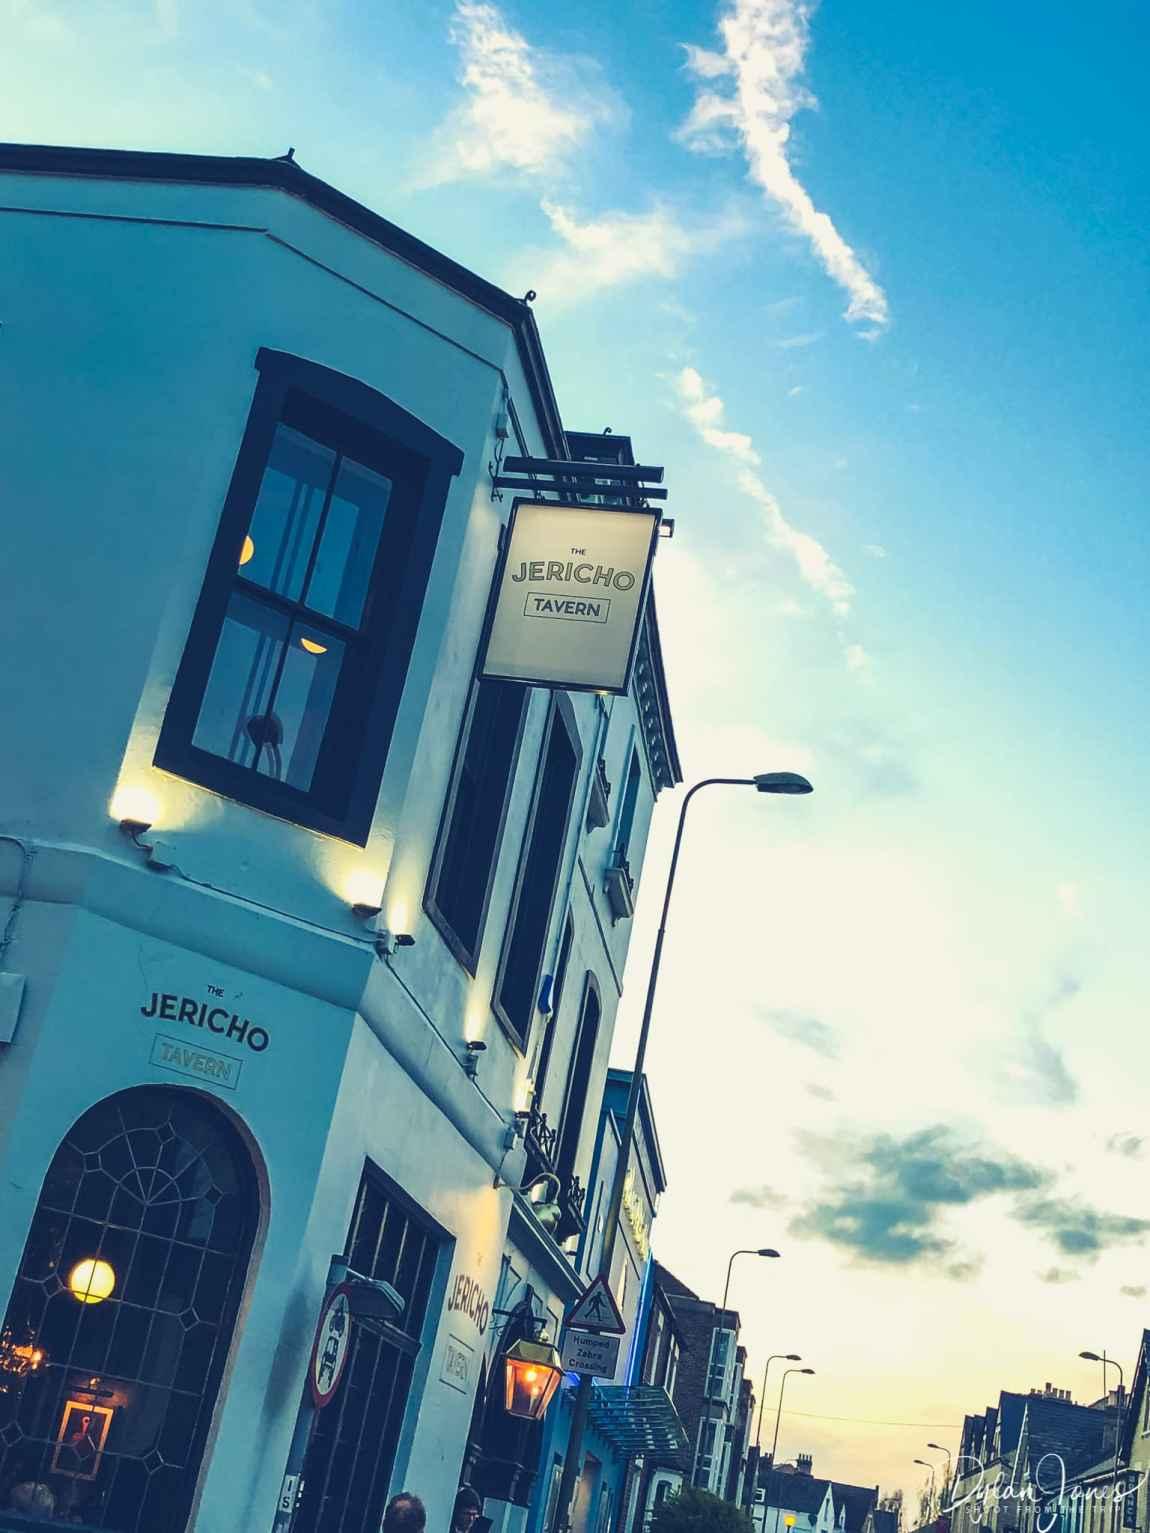 The Jericho Tavern - a great live music venue